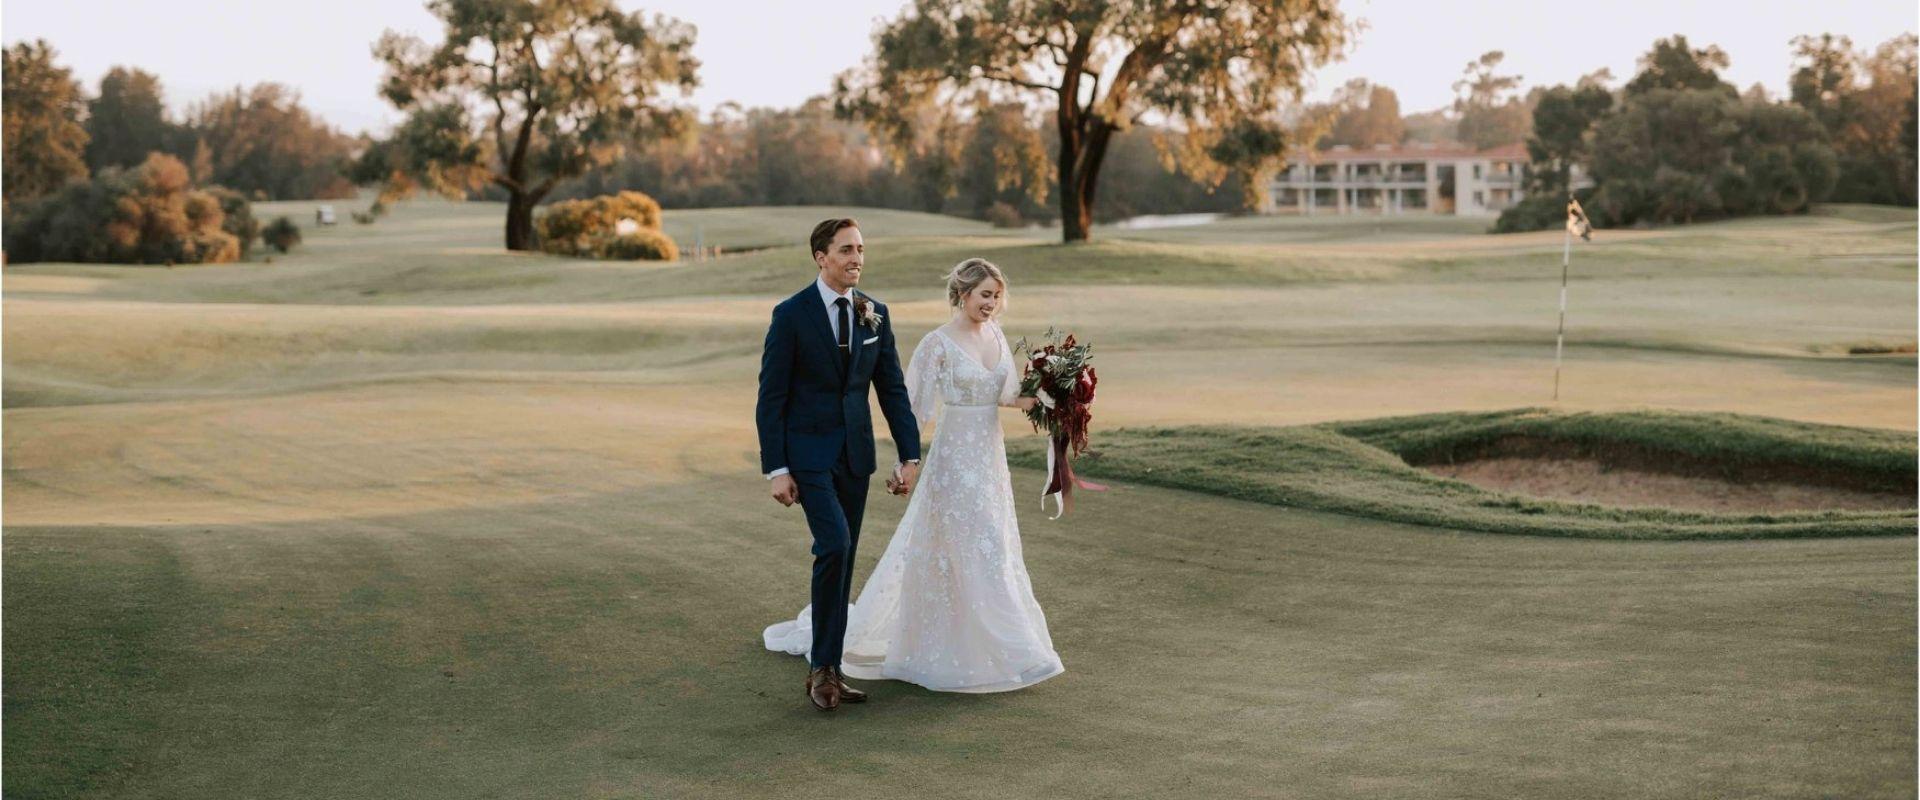 Weddings At The Vines The Vines Resort